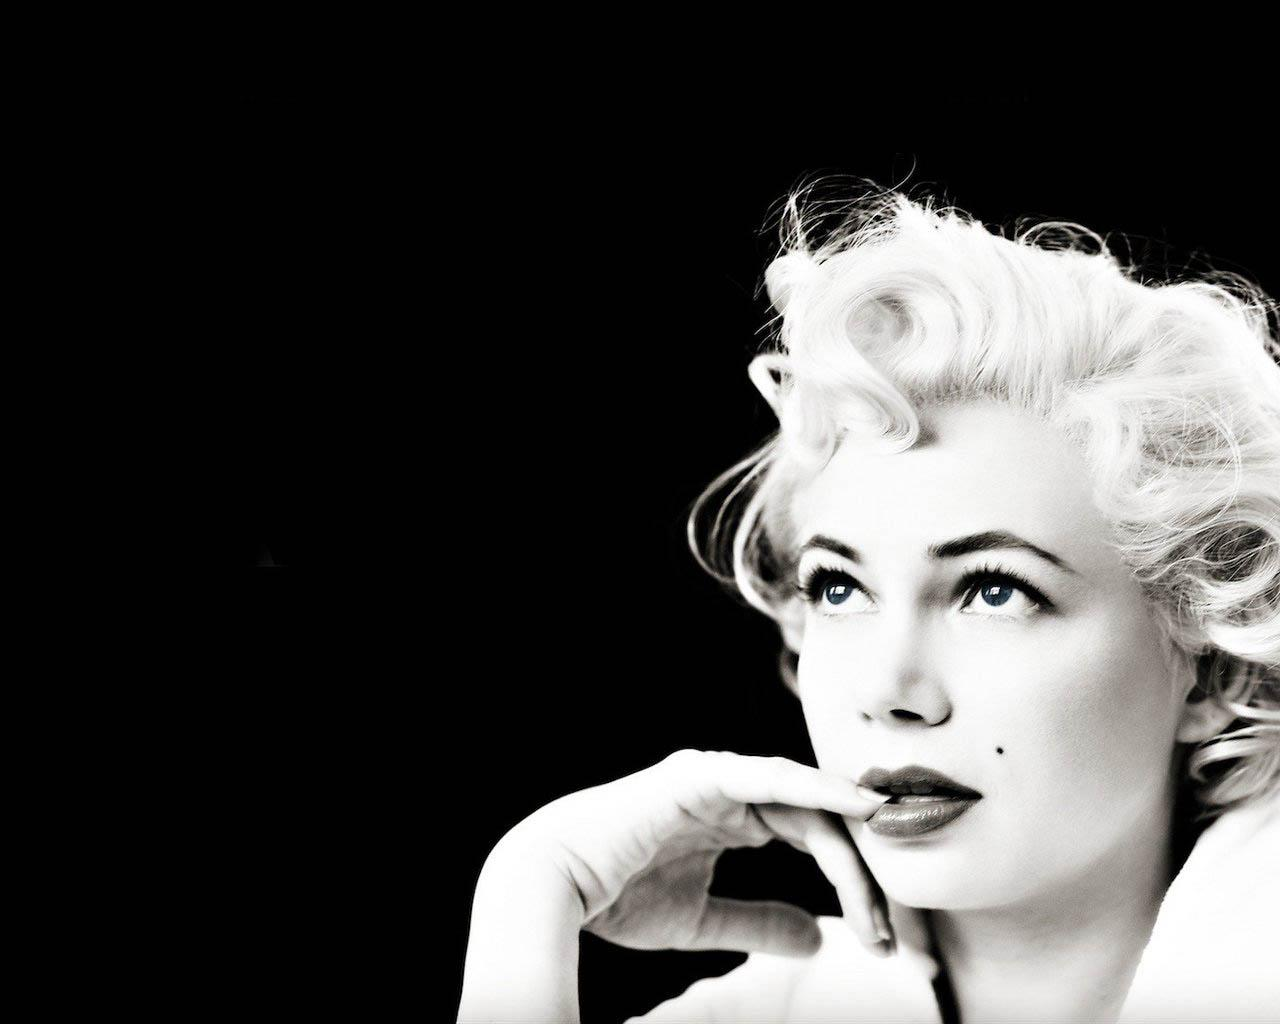 http://4.bp.blogspot.com/-J33GDlcPV-M/T5t8-uqvTAI/AAAAAAAAA2w/Oxp11sLlGUo/s1600/Marilyn+1.jpg